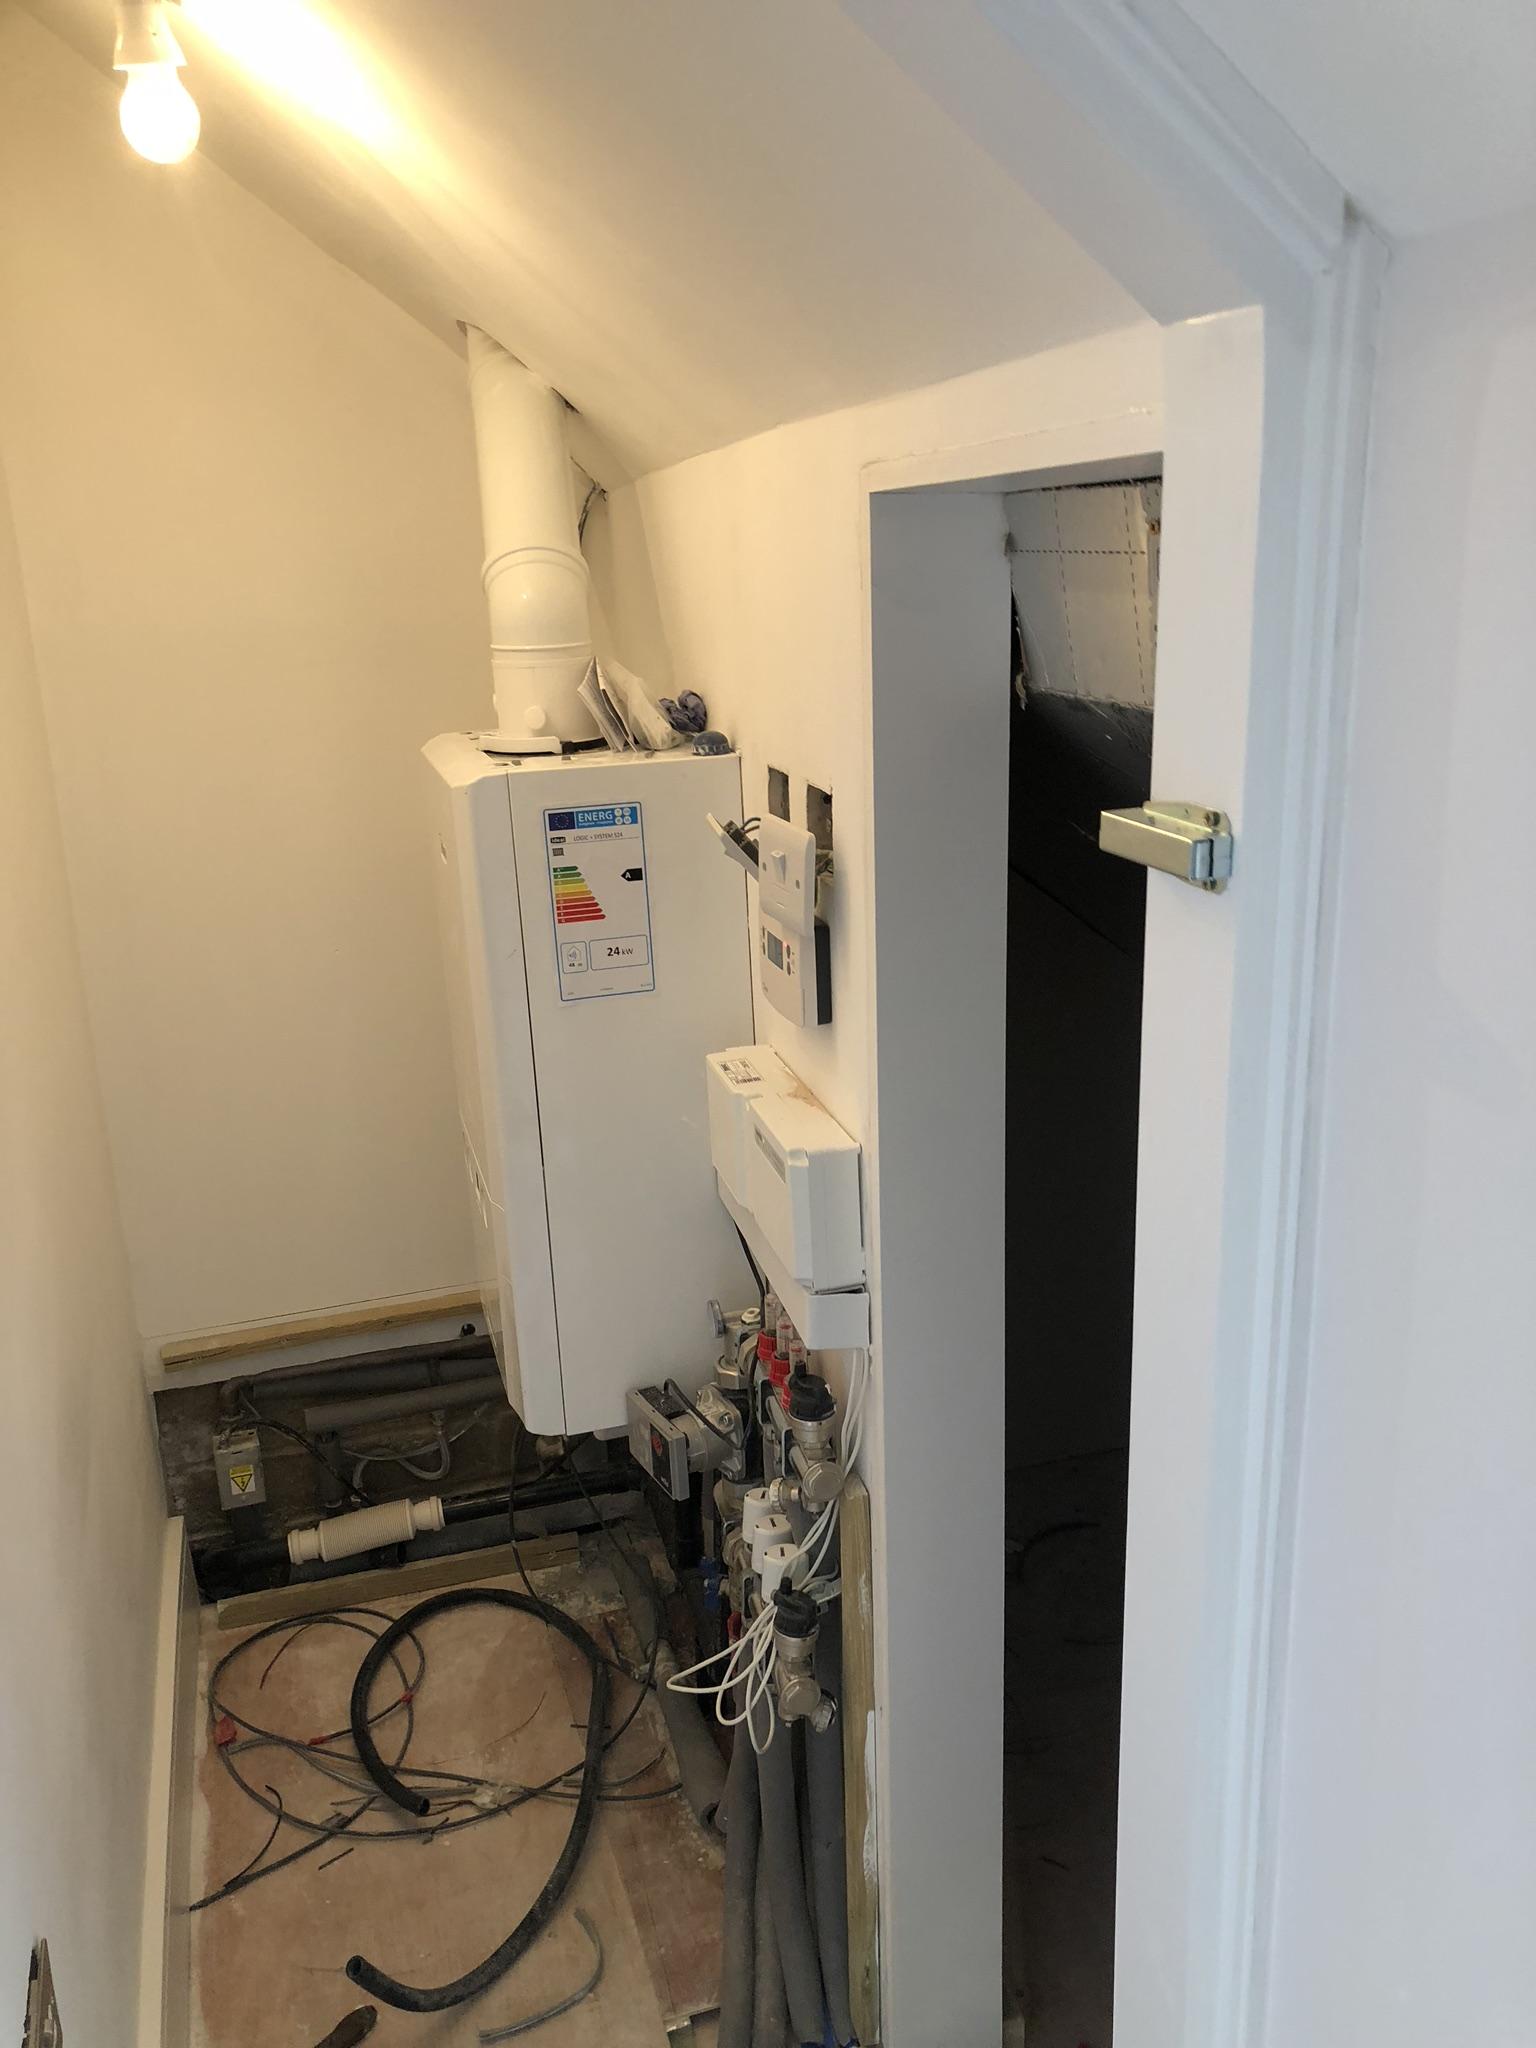 Crystal Palace Plumbers Heating Engineers London Uk Se19 Uk